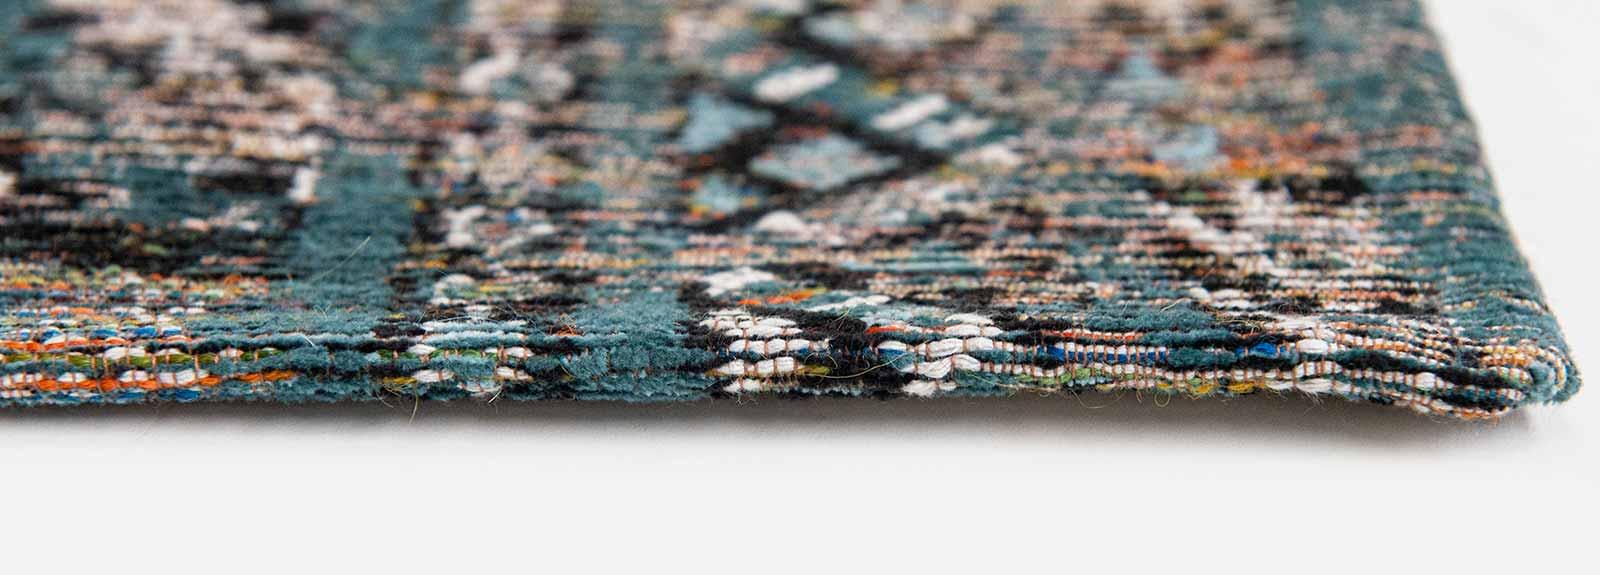 Louis De Poortere teppich LX 9110 Antiquarian Kilim Zemmuri Blue side